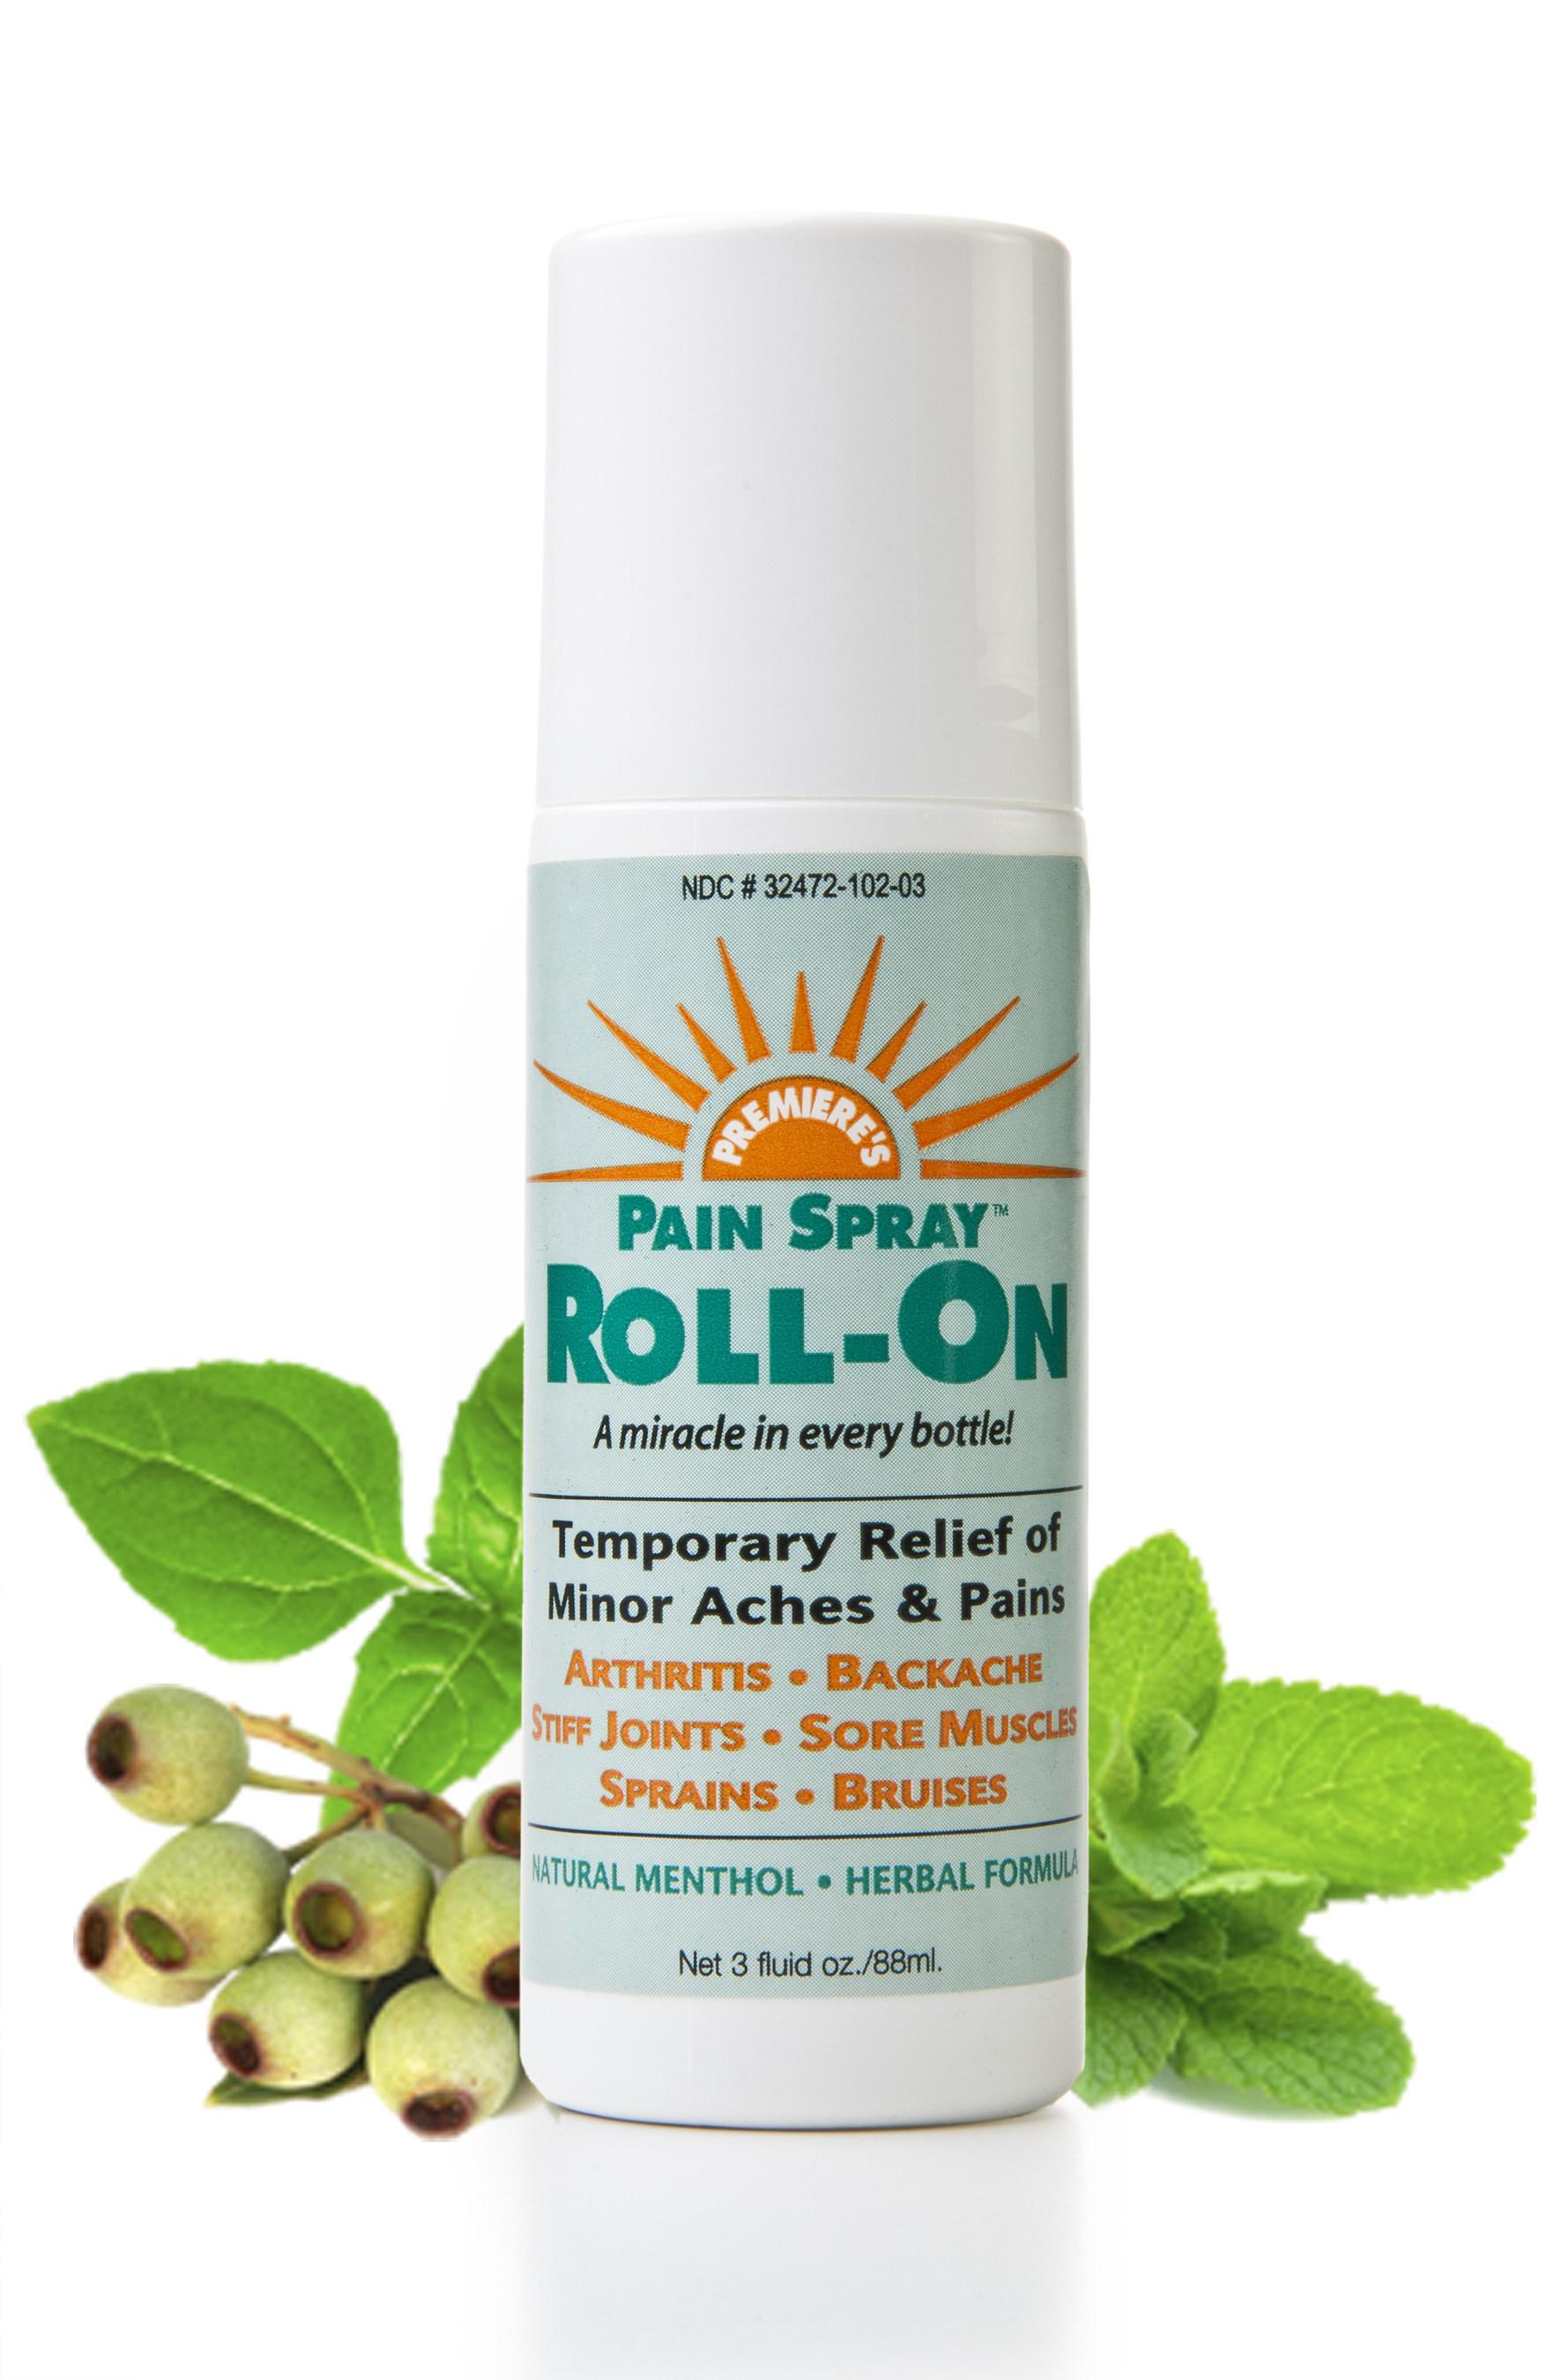 Pain Spray Roll-On